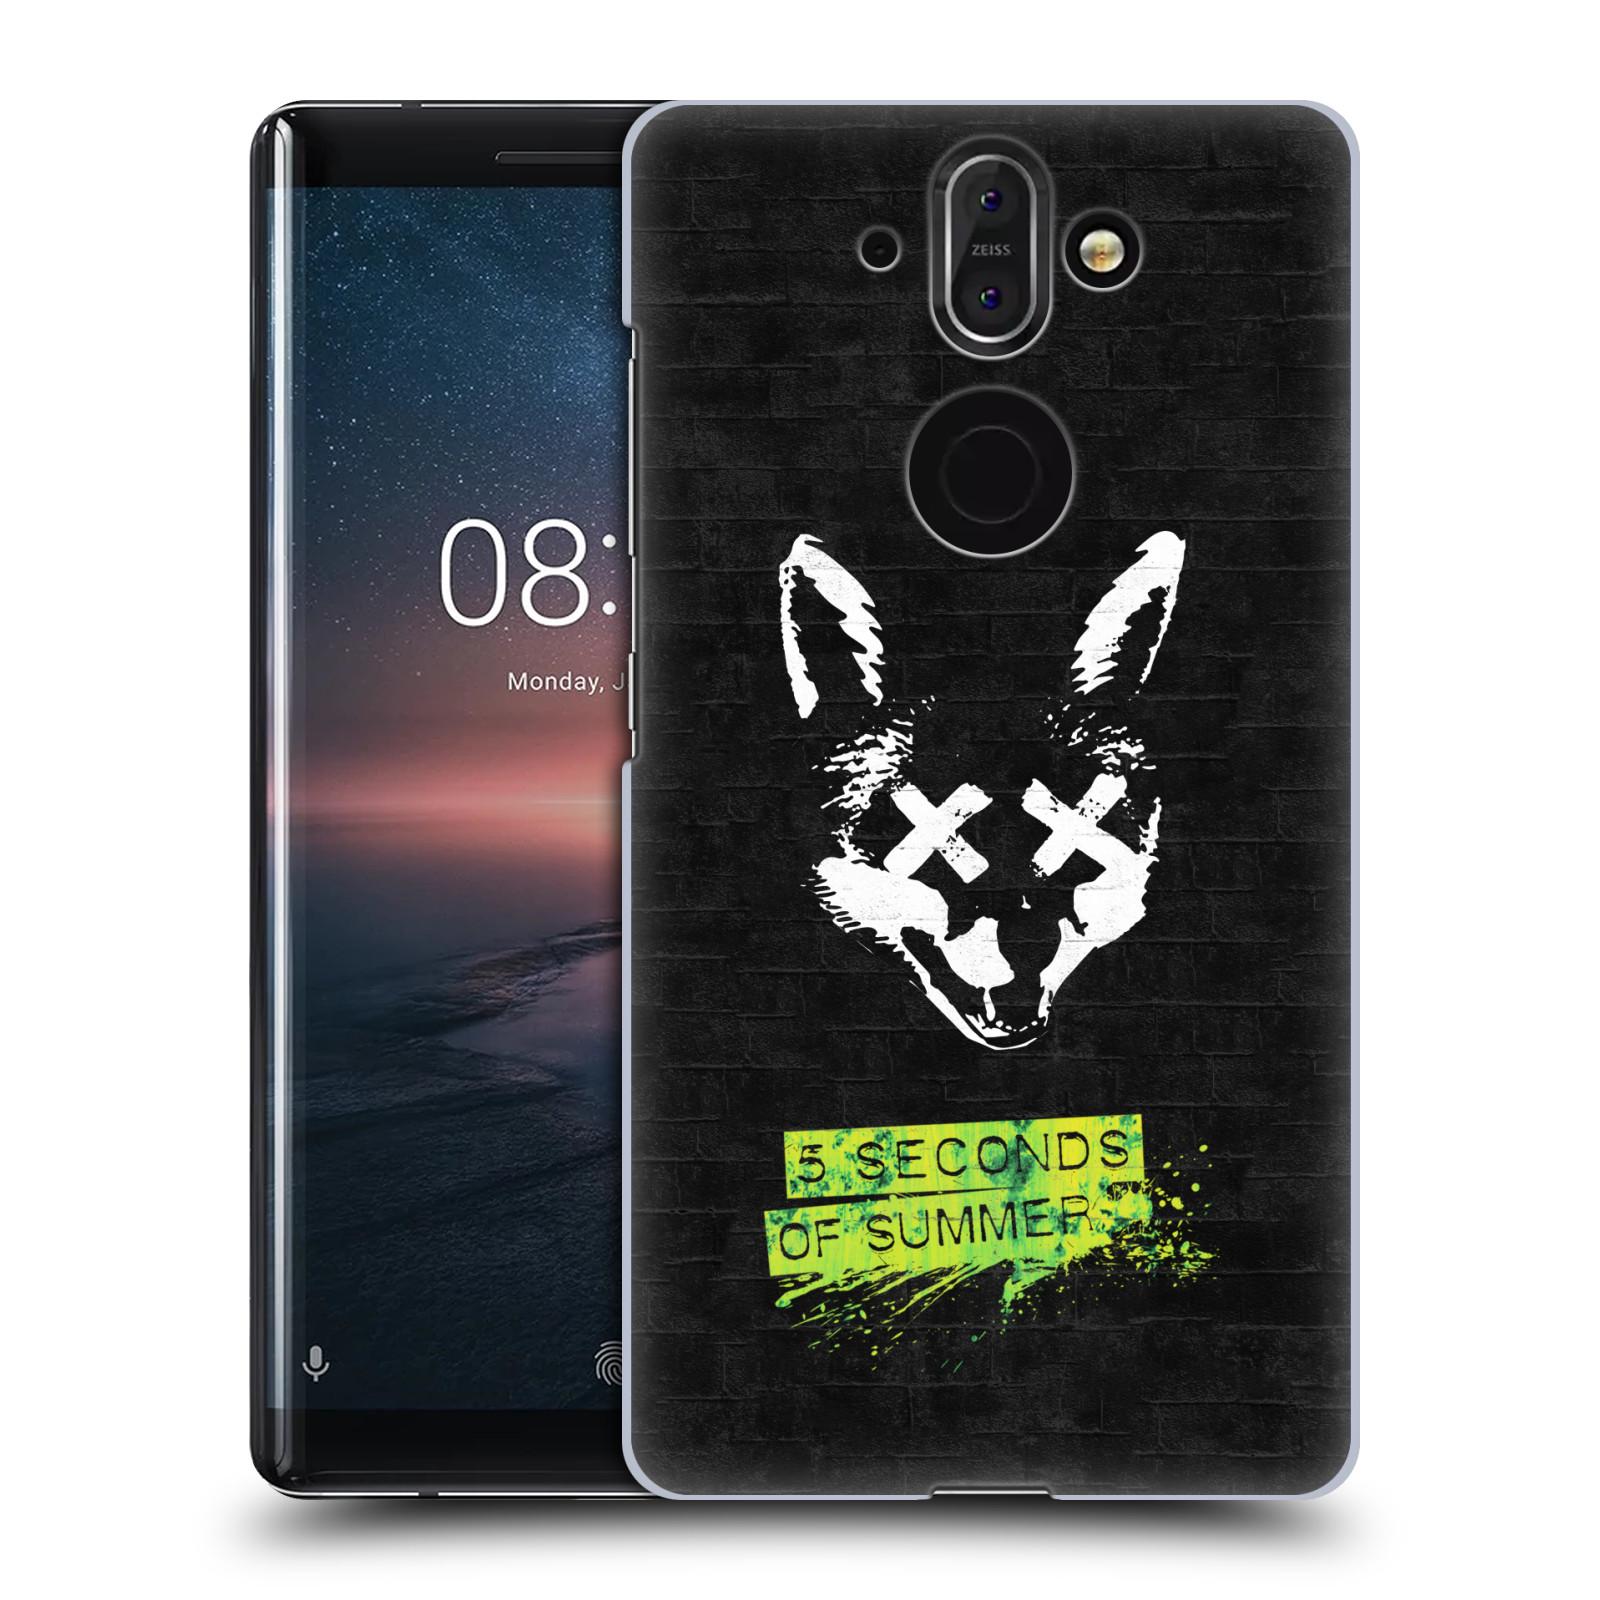 Plastové pouzdro na mobil Nokia 8 Sirocco - Head Case - 5 Seconds of Summer - Fox